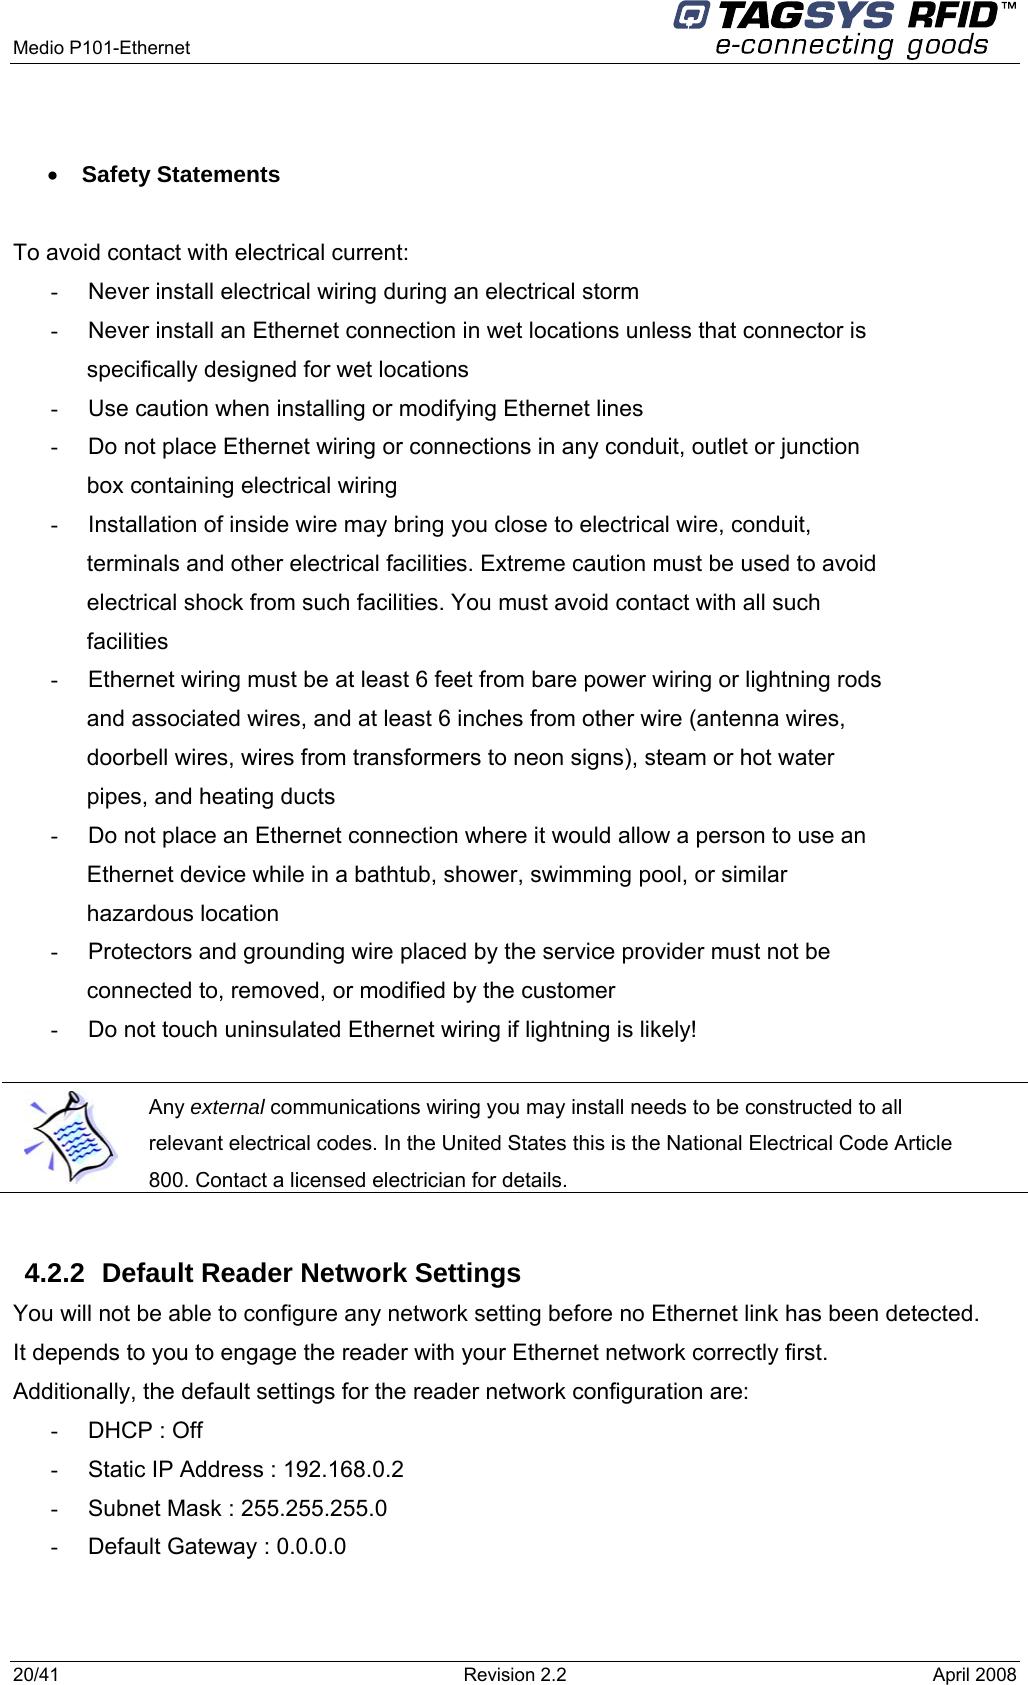 Tagsys Mediop101ether Rfid Tag Reader User Manual Manual